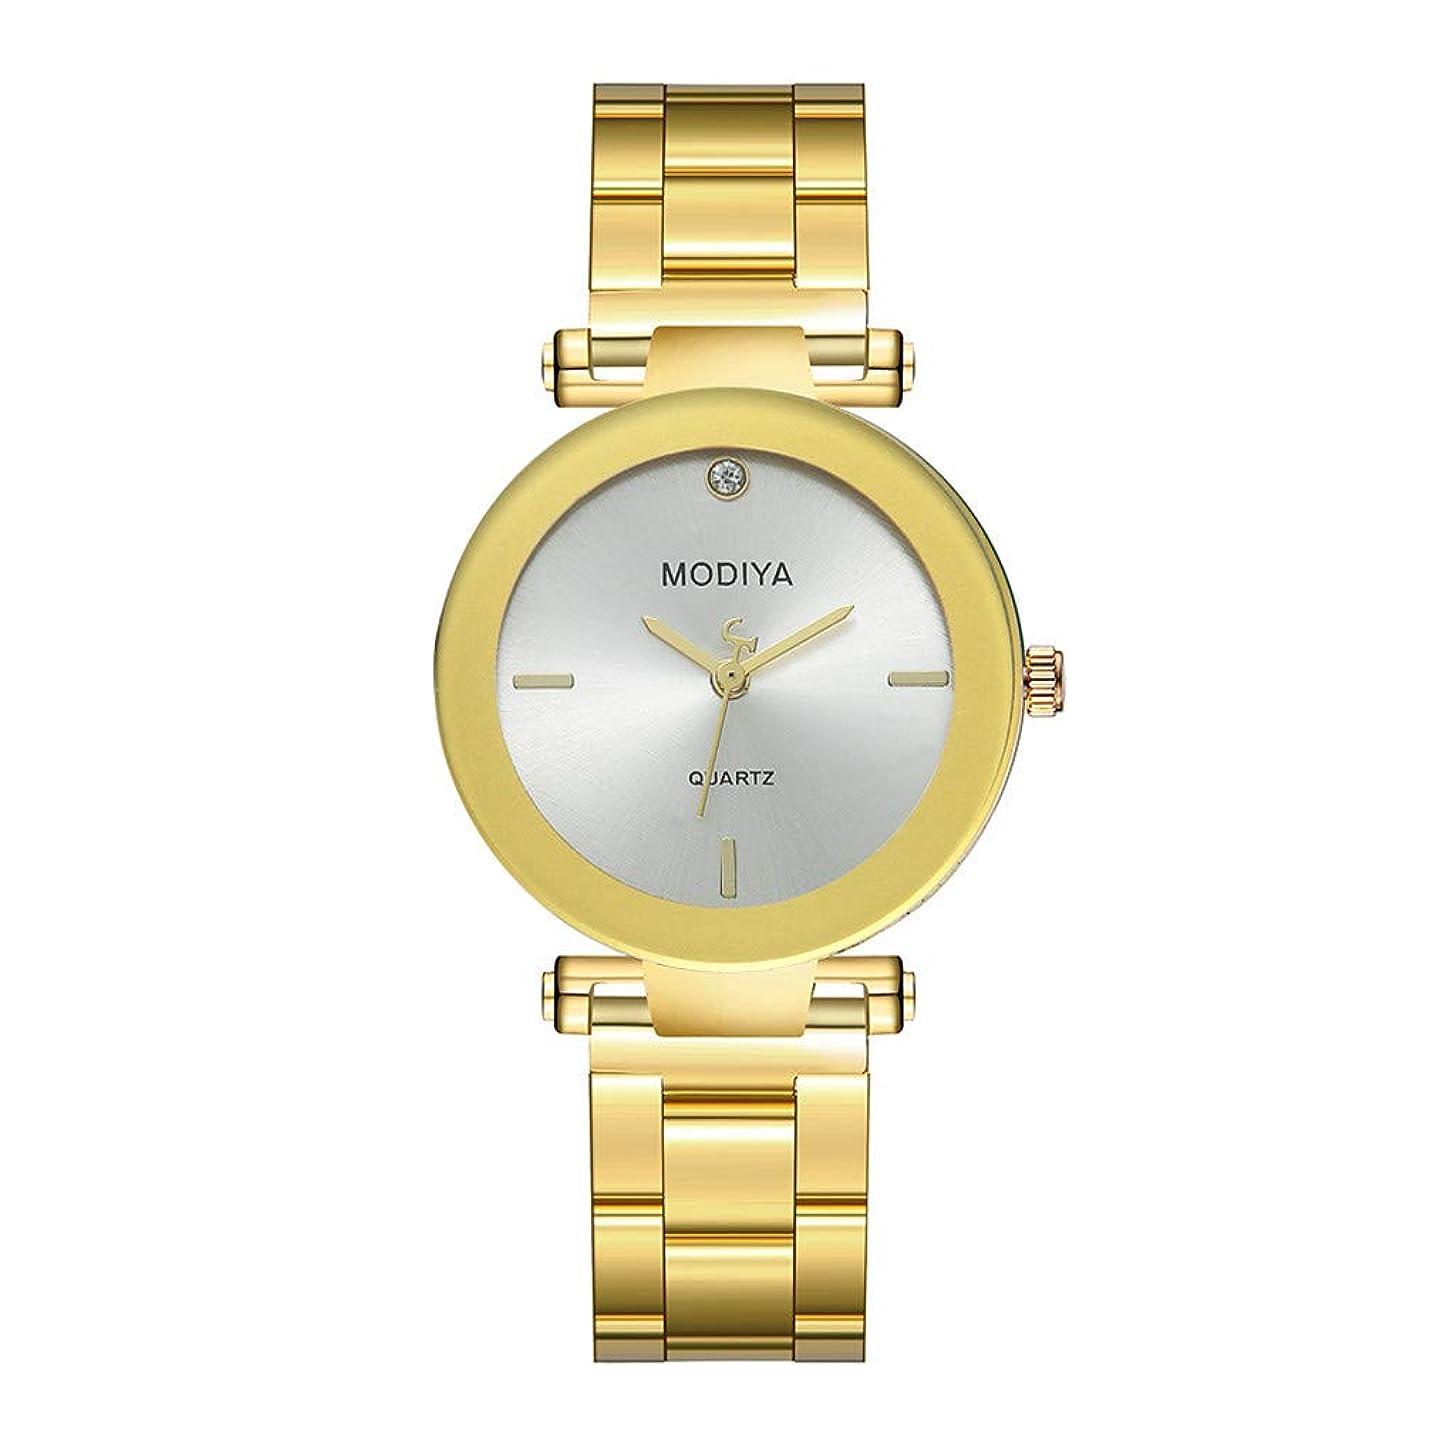 2019 Spring Deals! Wrist Watches Metal Bracelet Stainless Steel Sport Quartz Hour Wrist Analog Watch